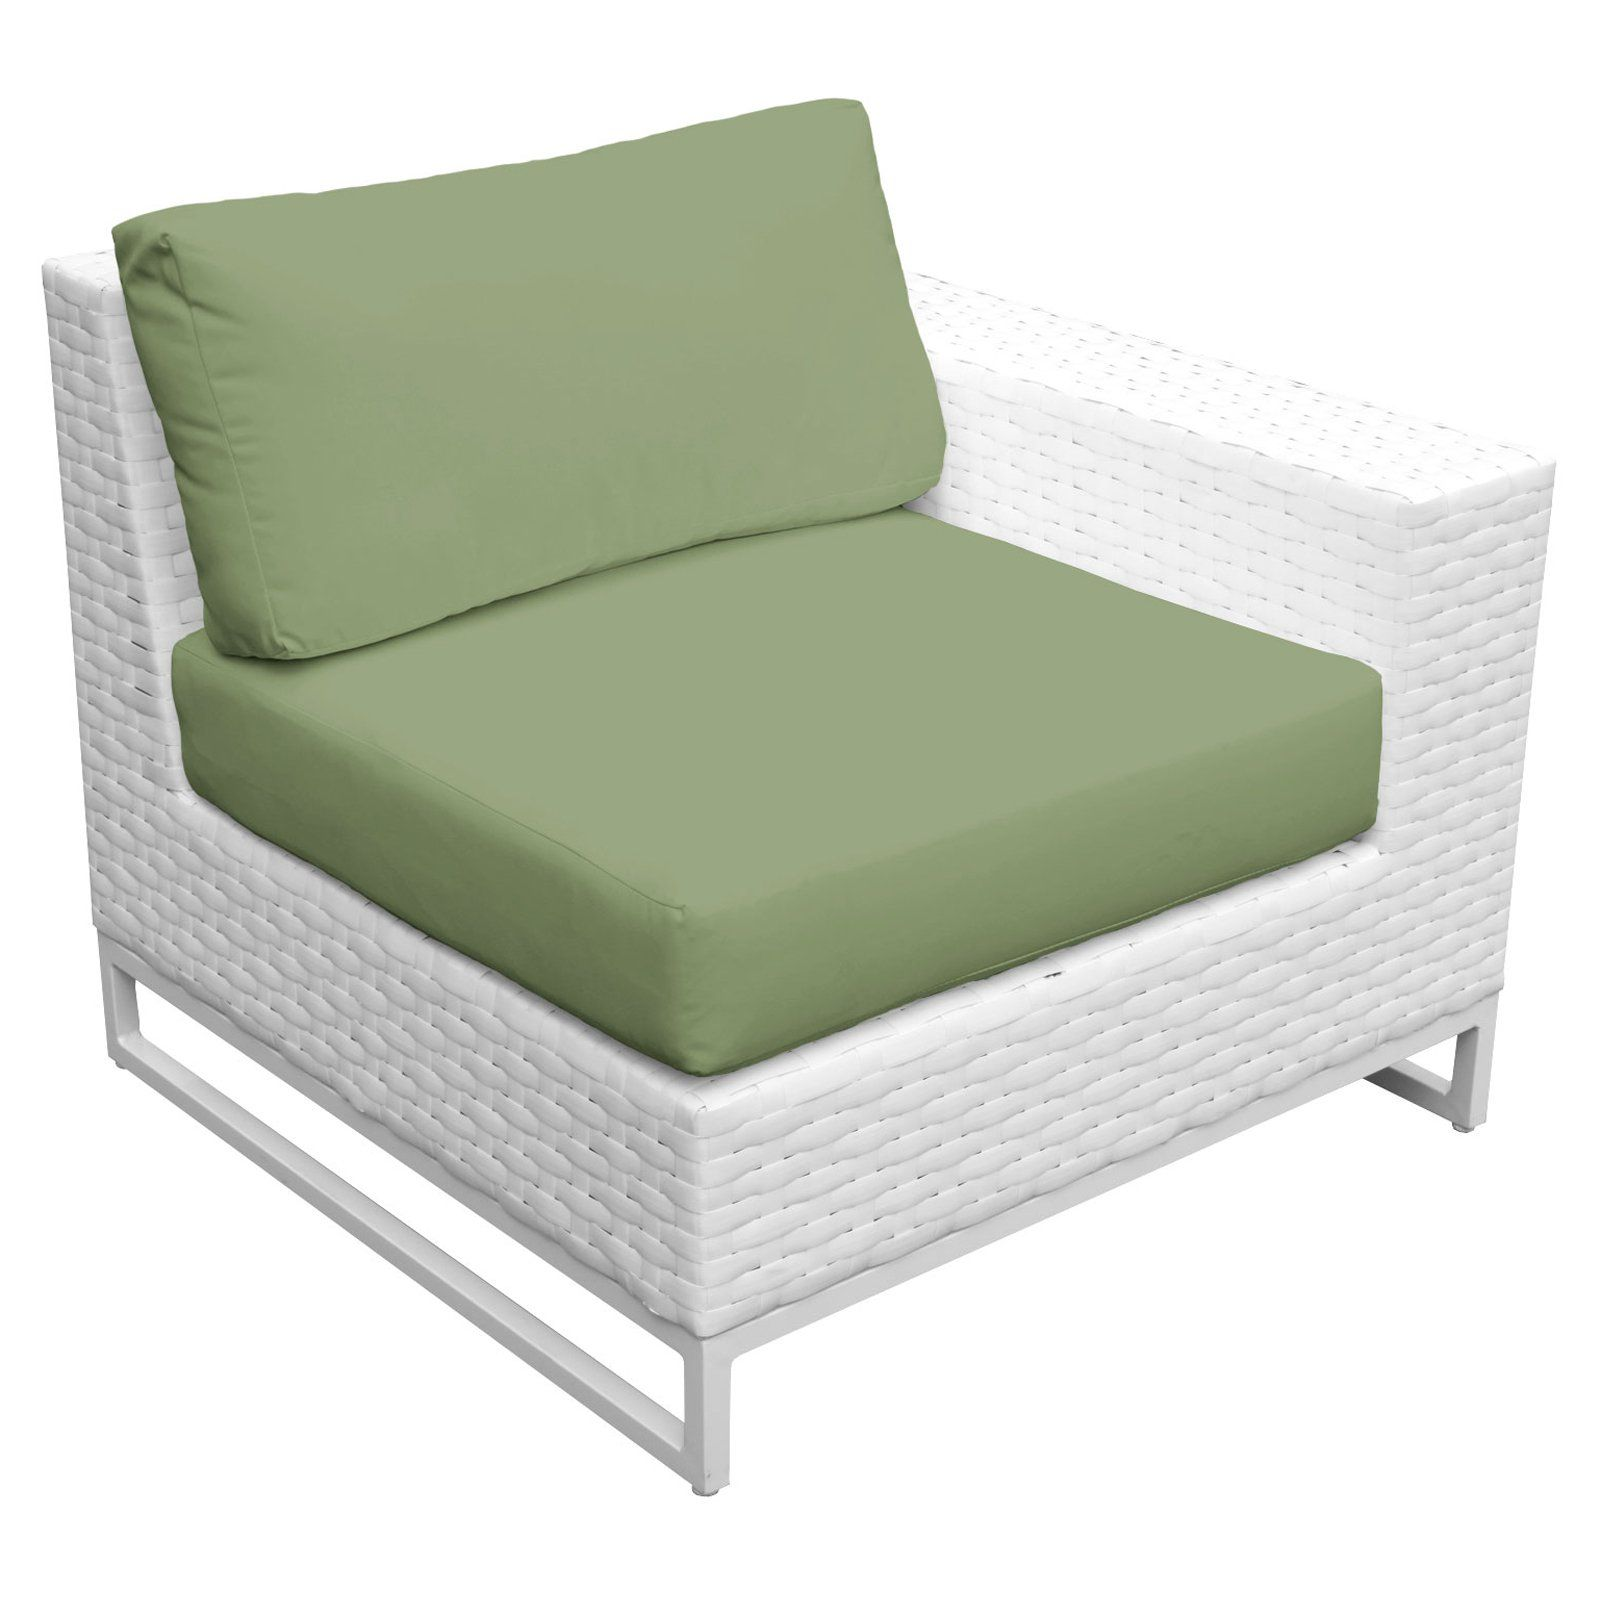 Tk Classics Miami Outdoor Arm Sofa Set Of 2 Cilantro